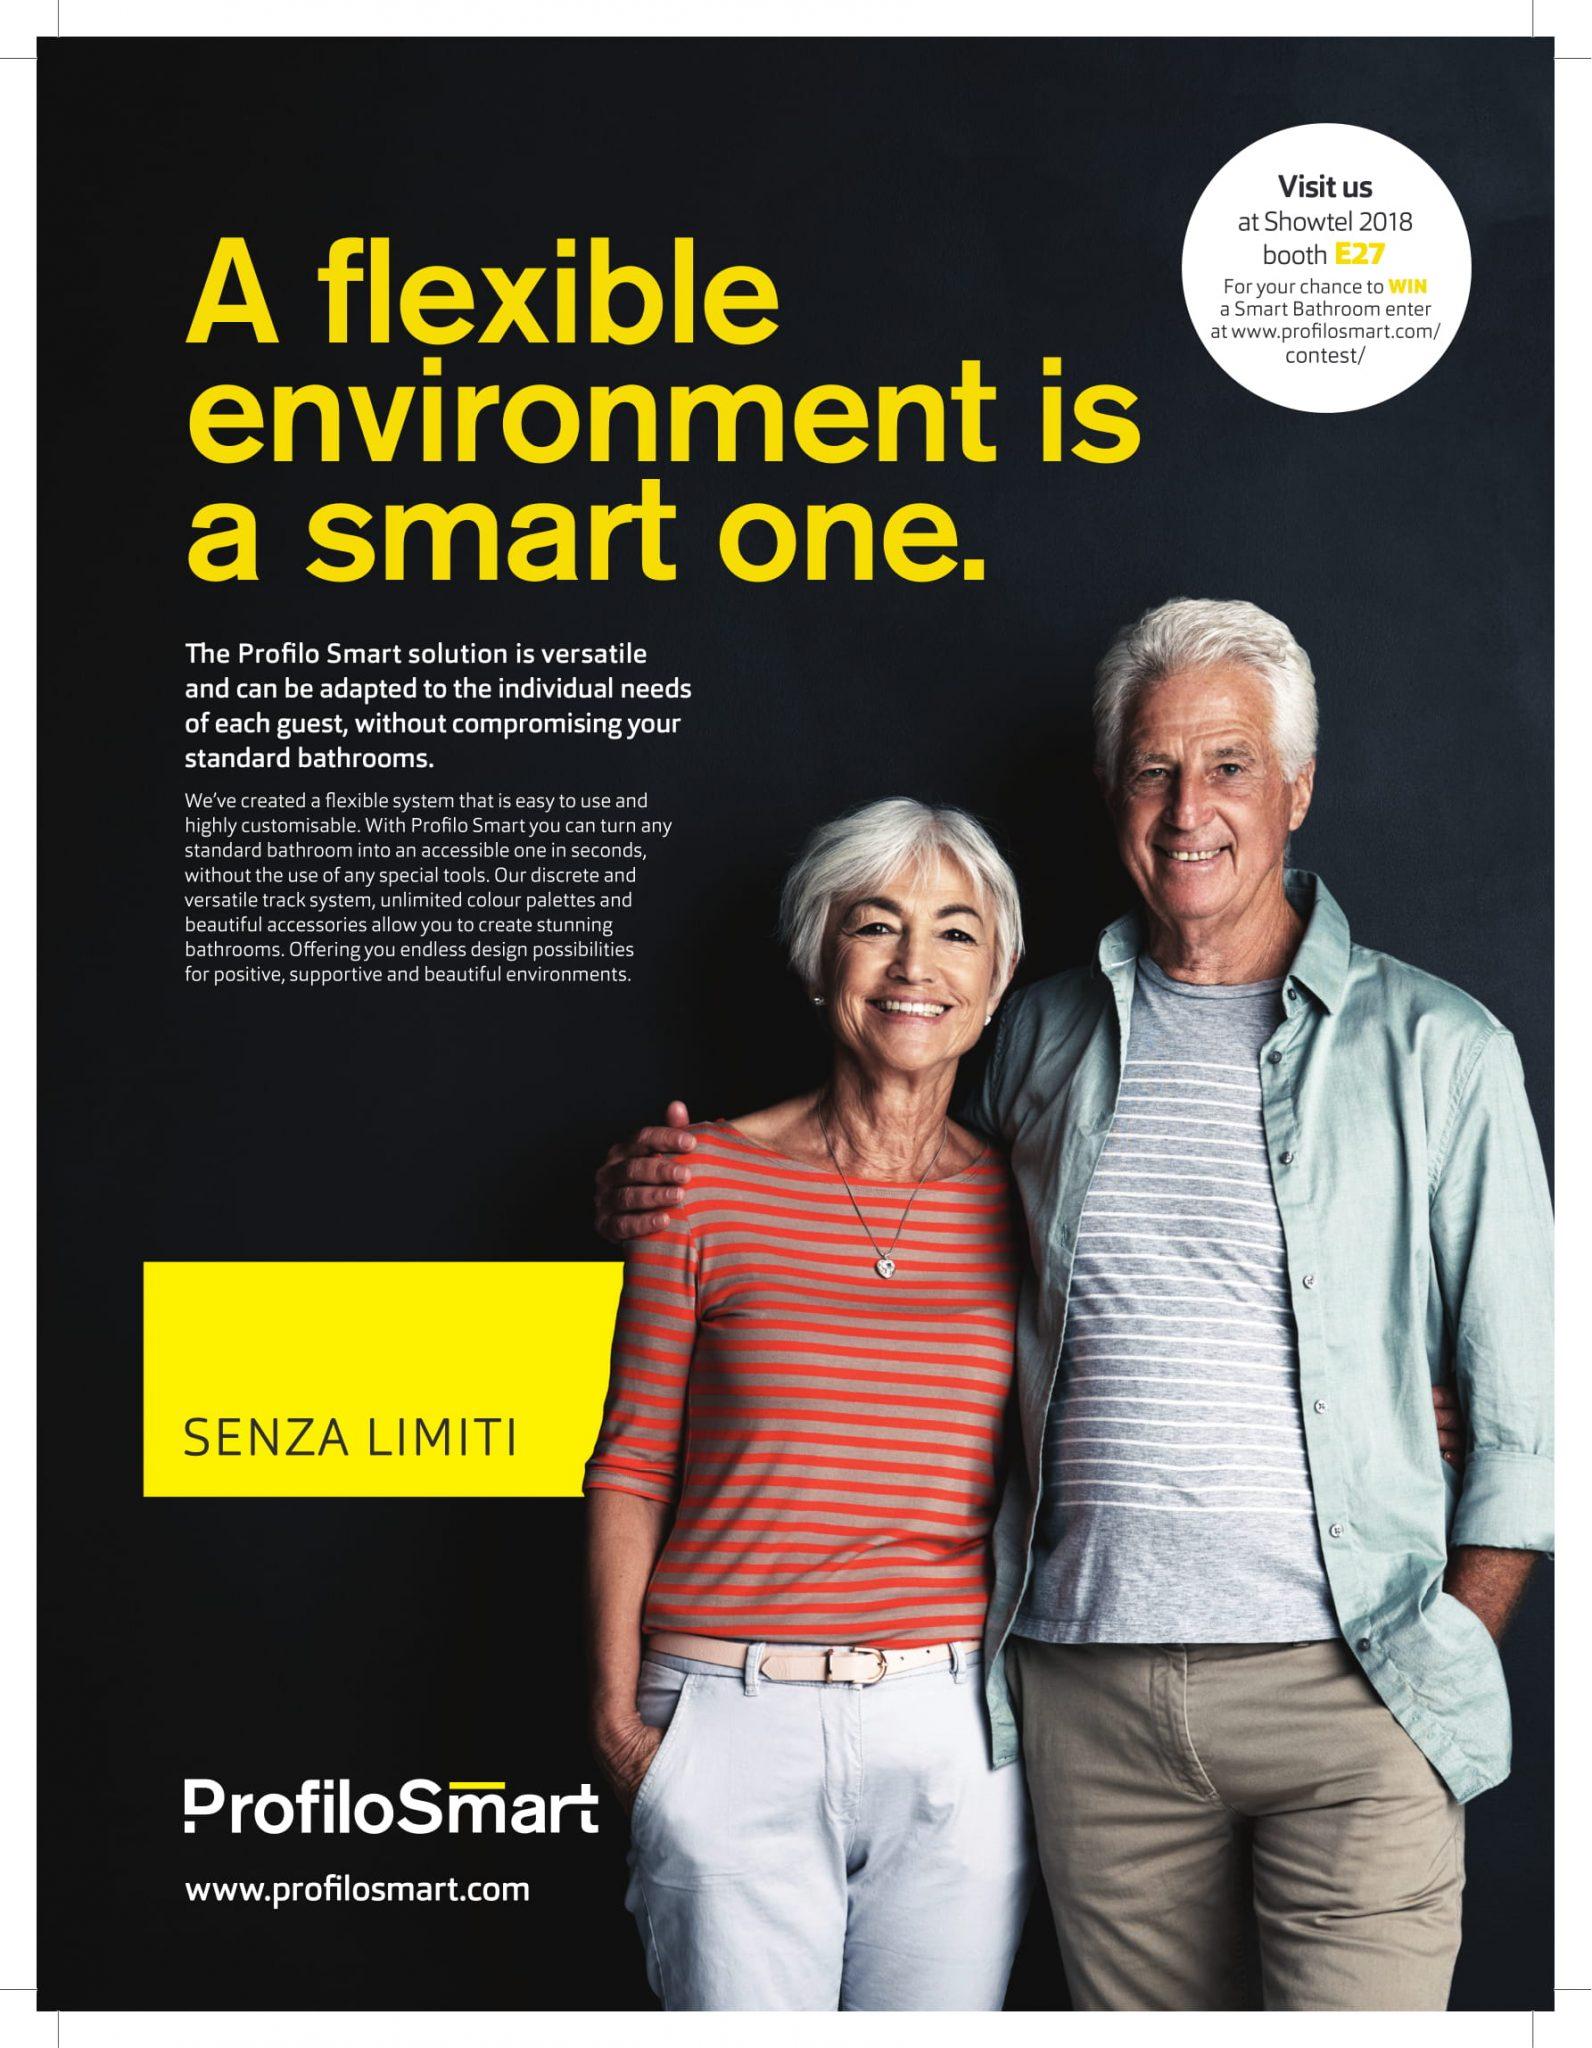 Profilo Smart, flexible, accessible, bathrooms, Universal Design